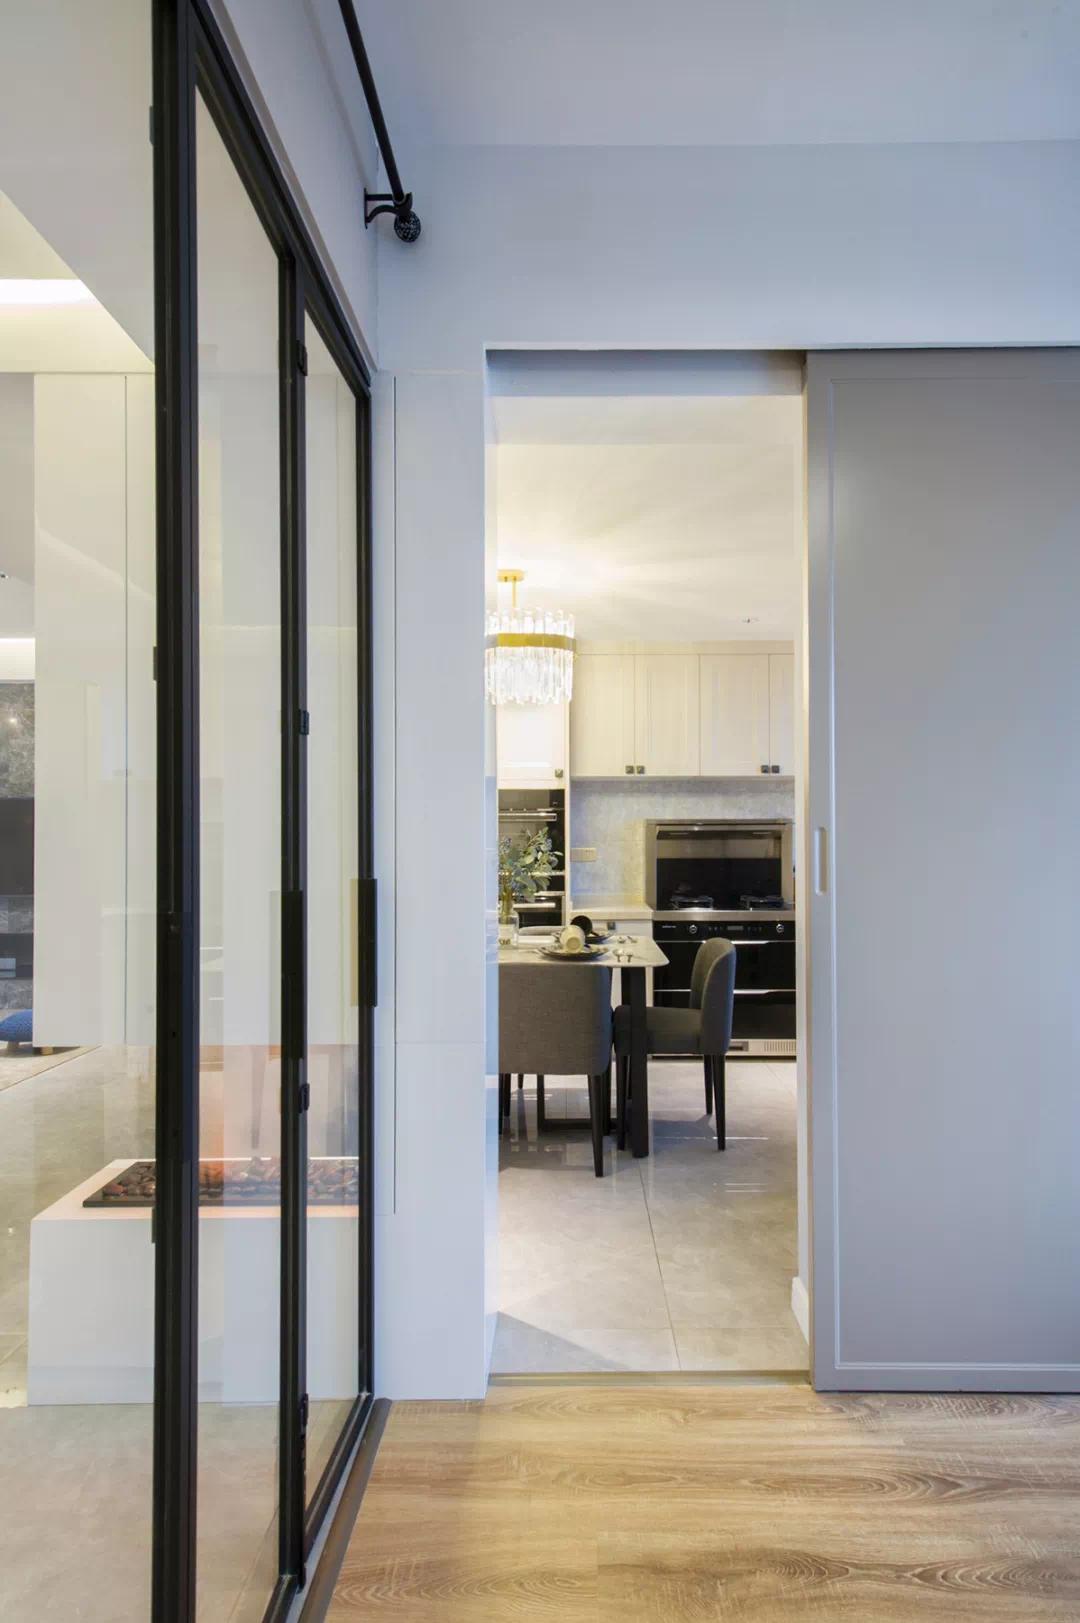 110m²舒适的现代风格,让家人舒适,让自己舒适 现代风格 装修 设计 第14张